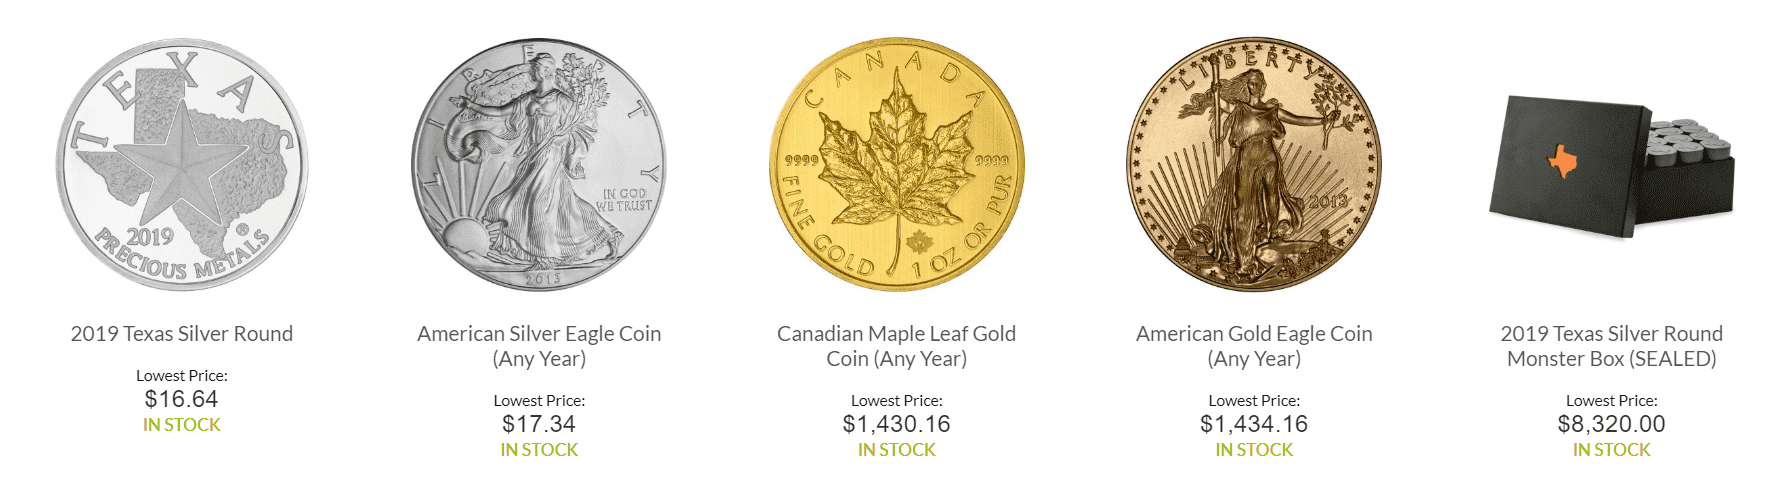 Texas Precious Metals Reviews Coins-min